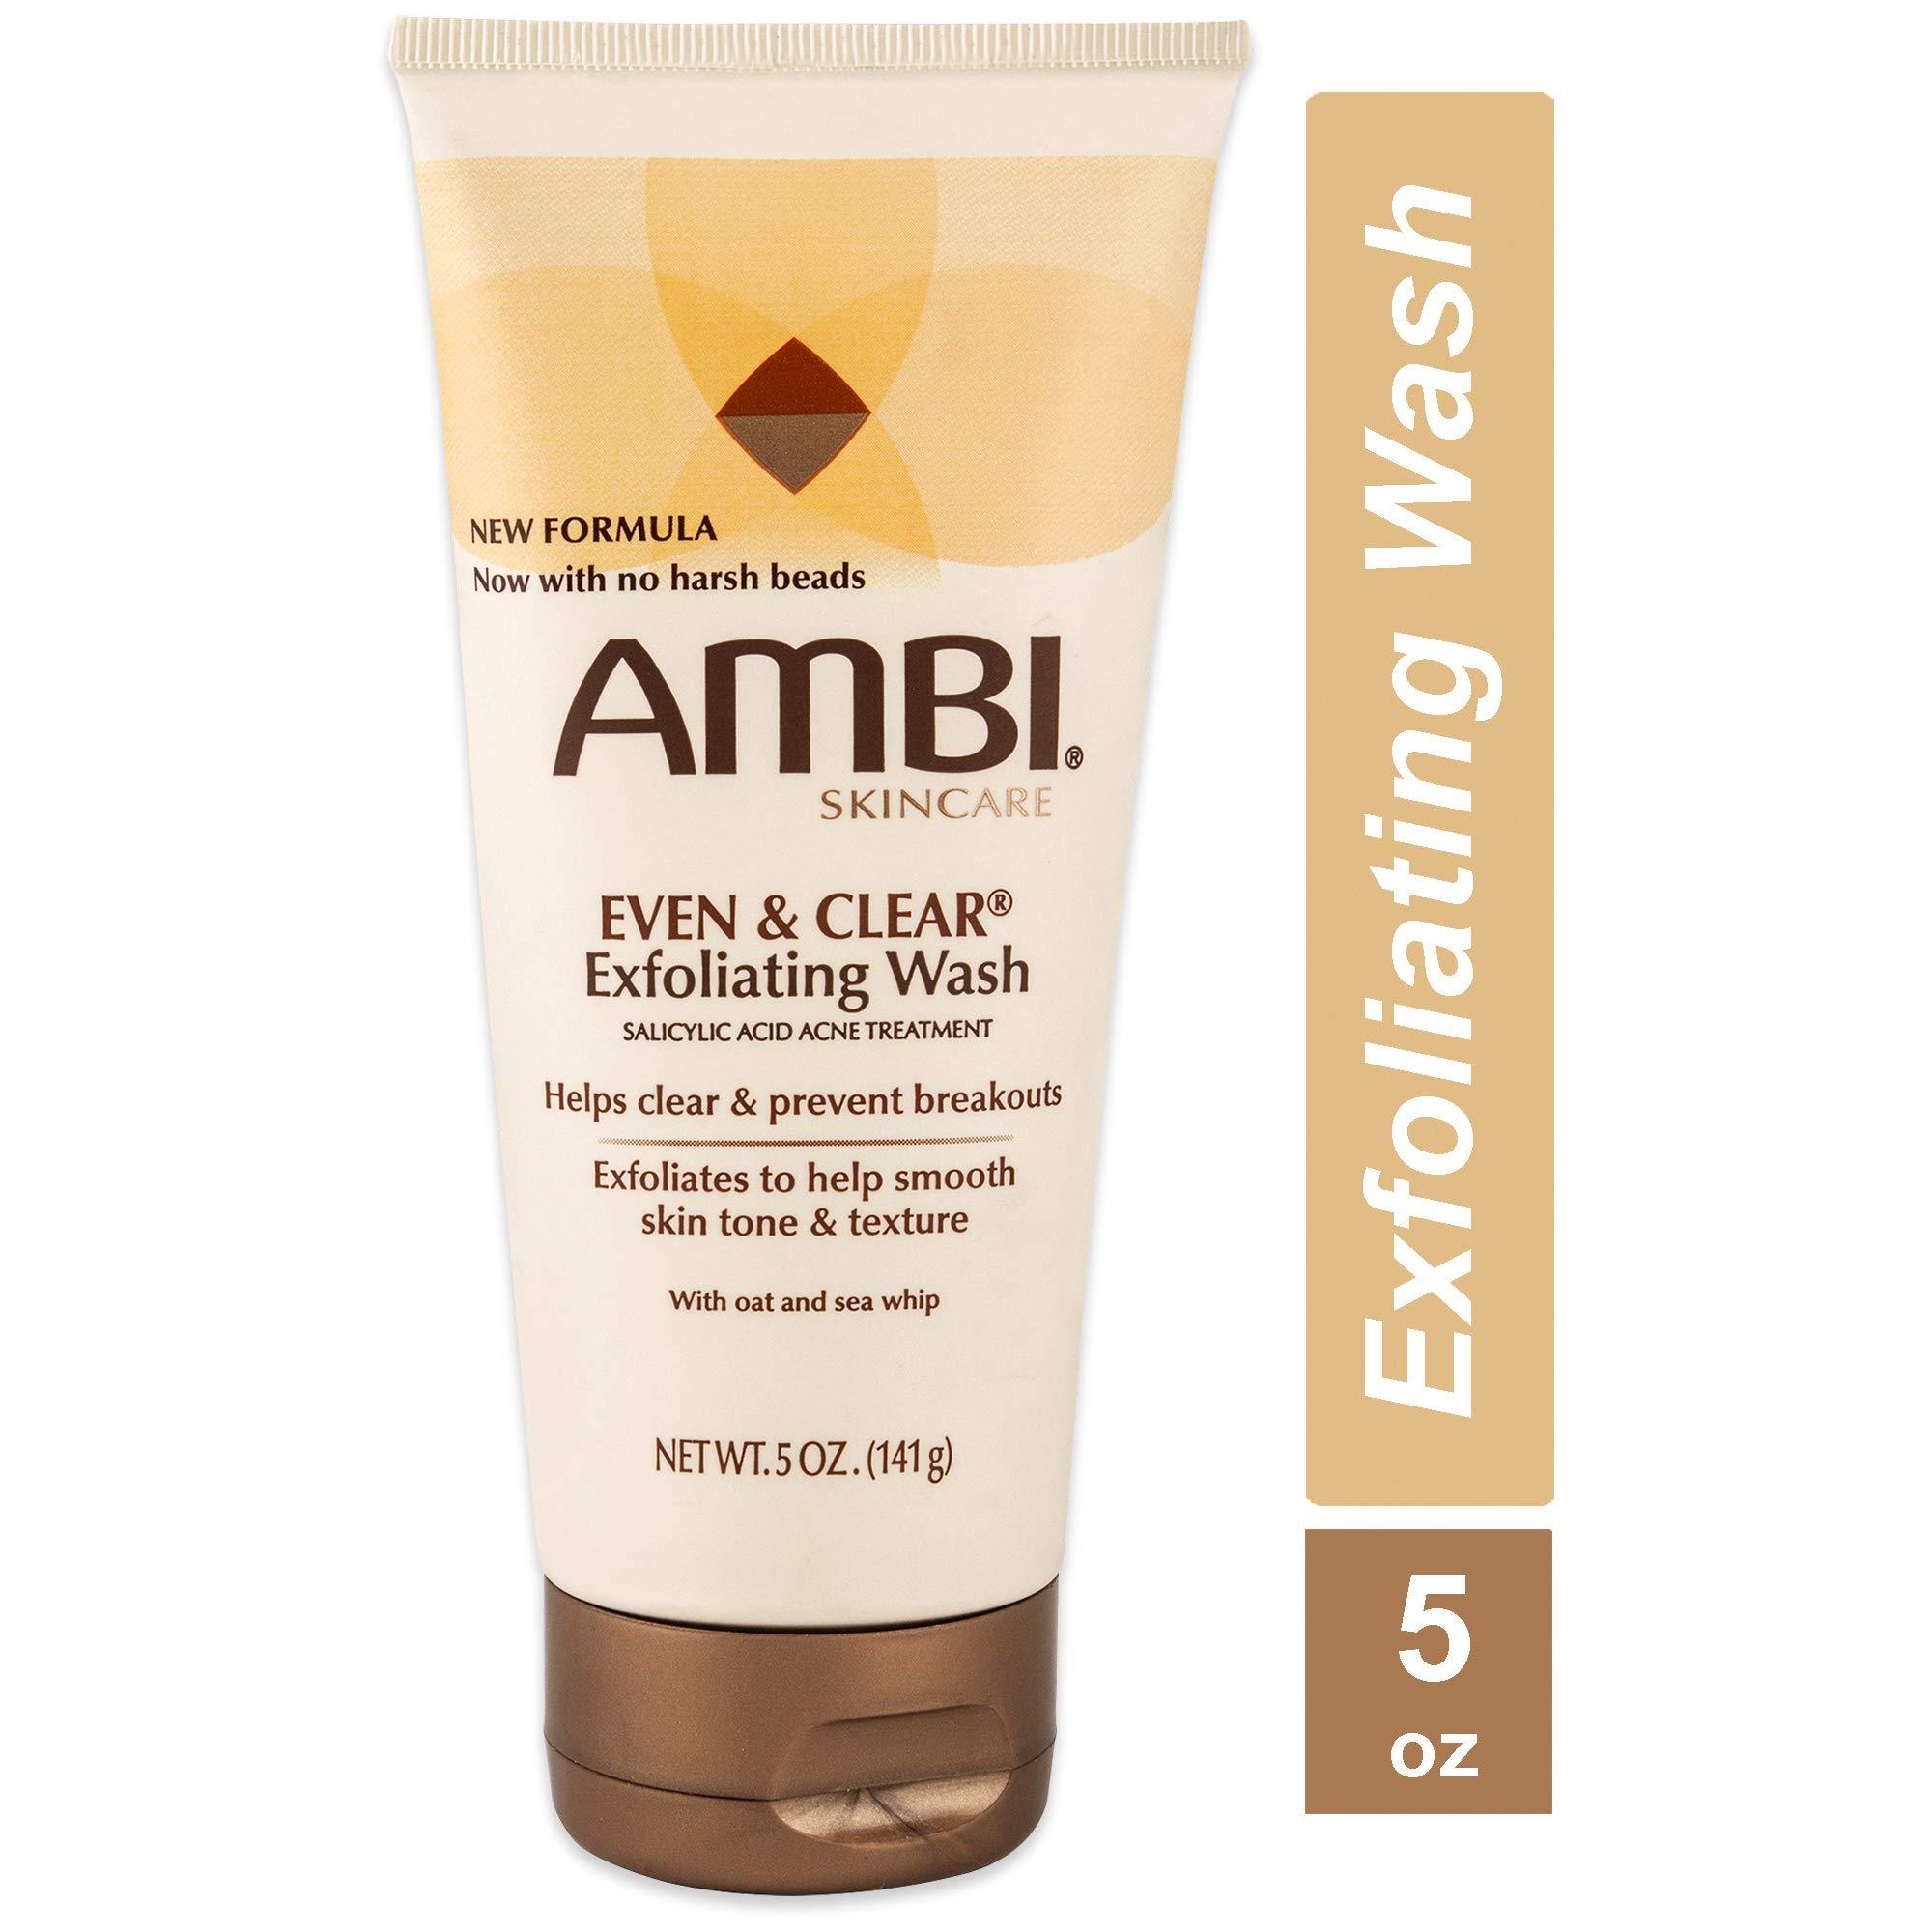 Ambi Even & Clear Exfoliating Wash 5 oz